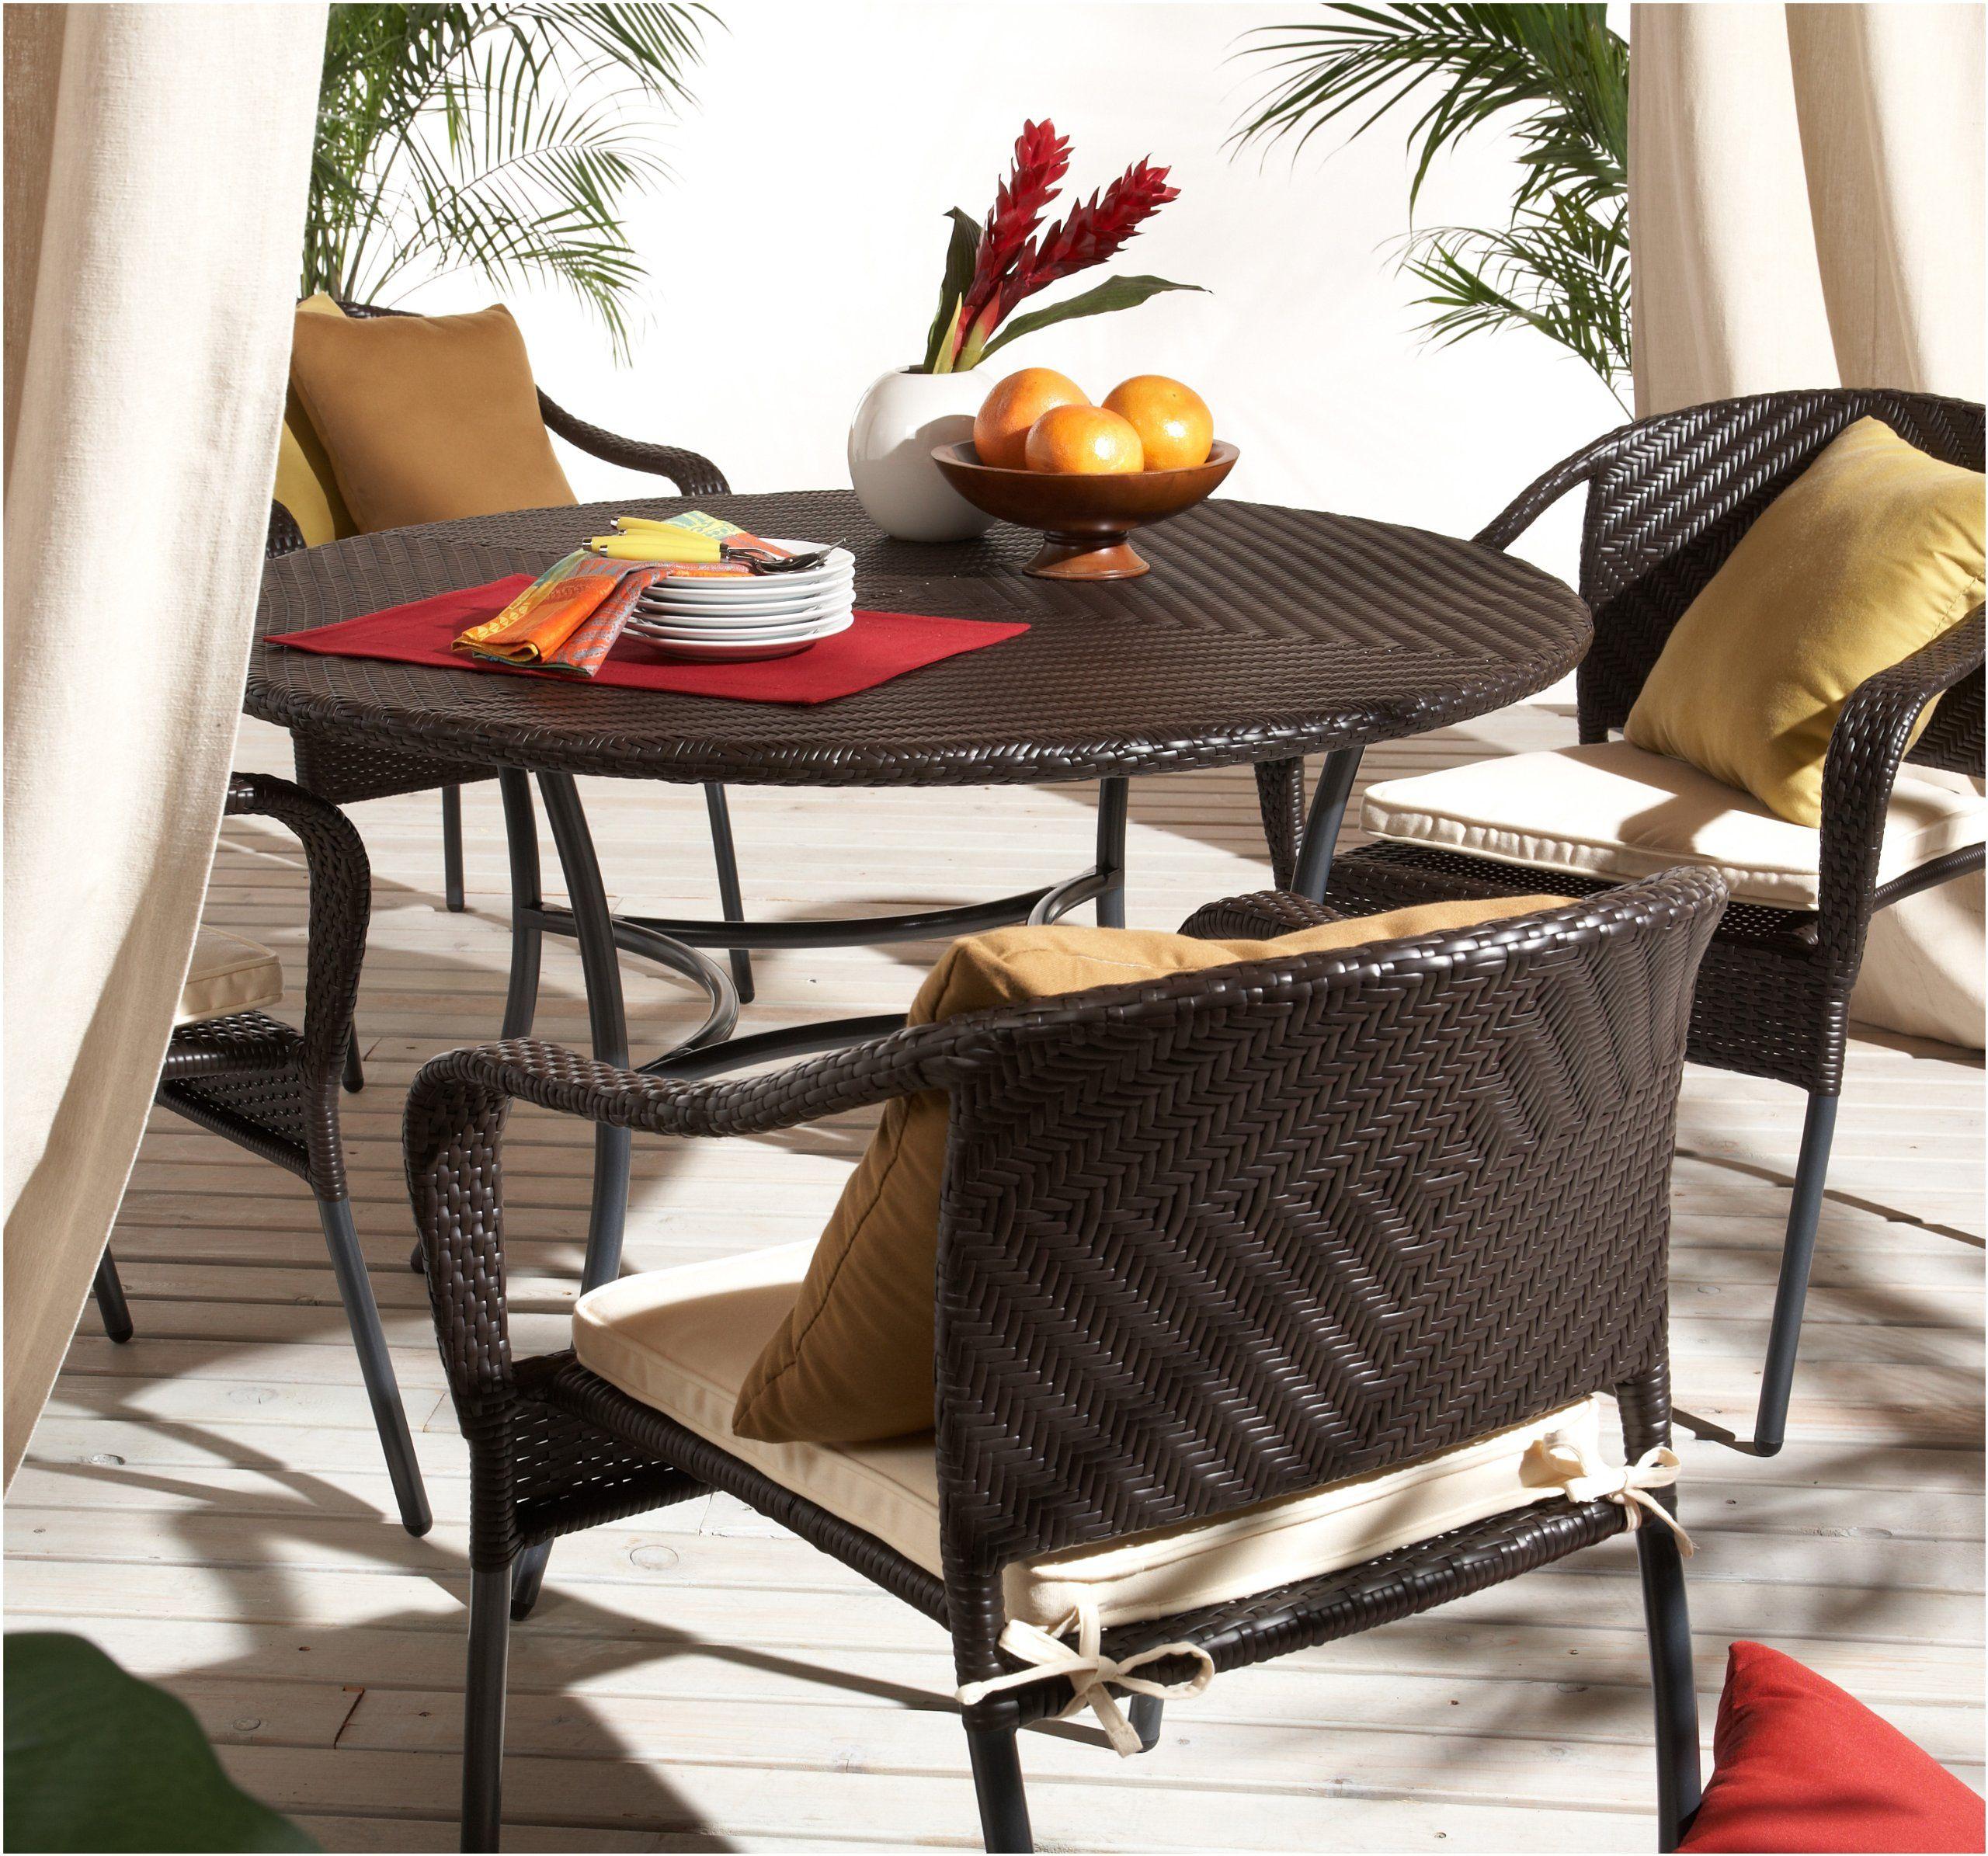 Stathwood amazon outdoor furniture pinterest for Furniture 0 interest